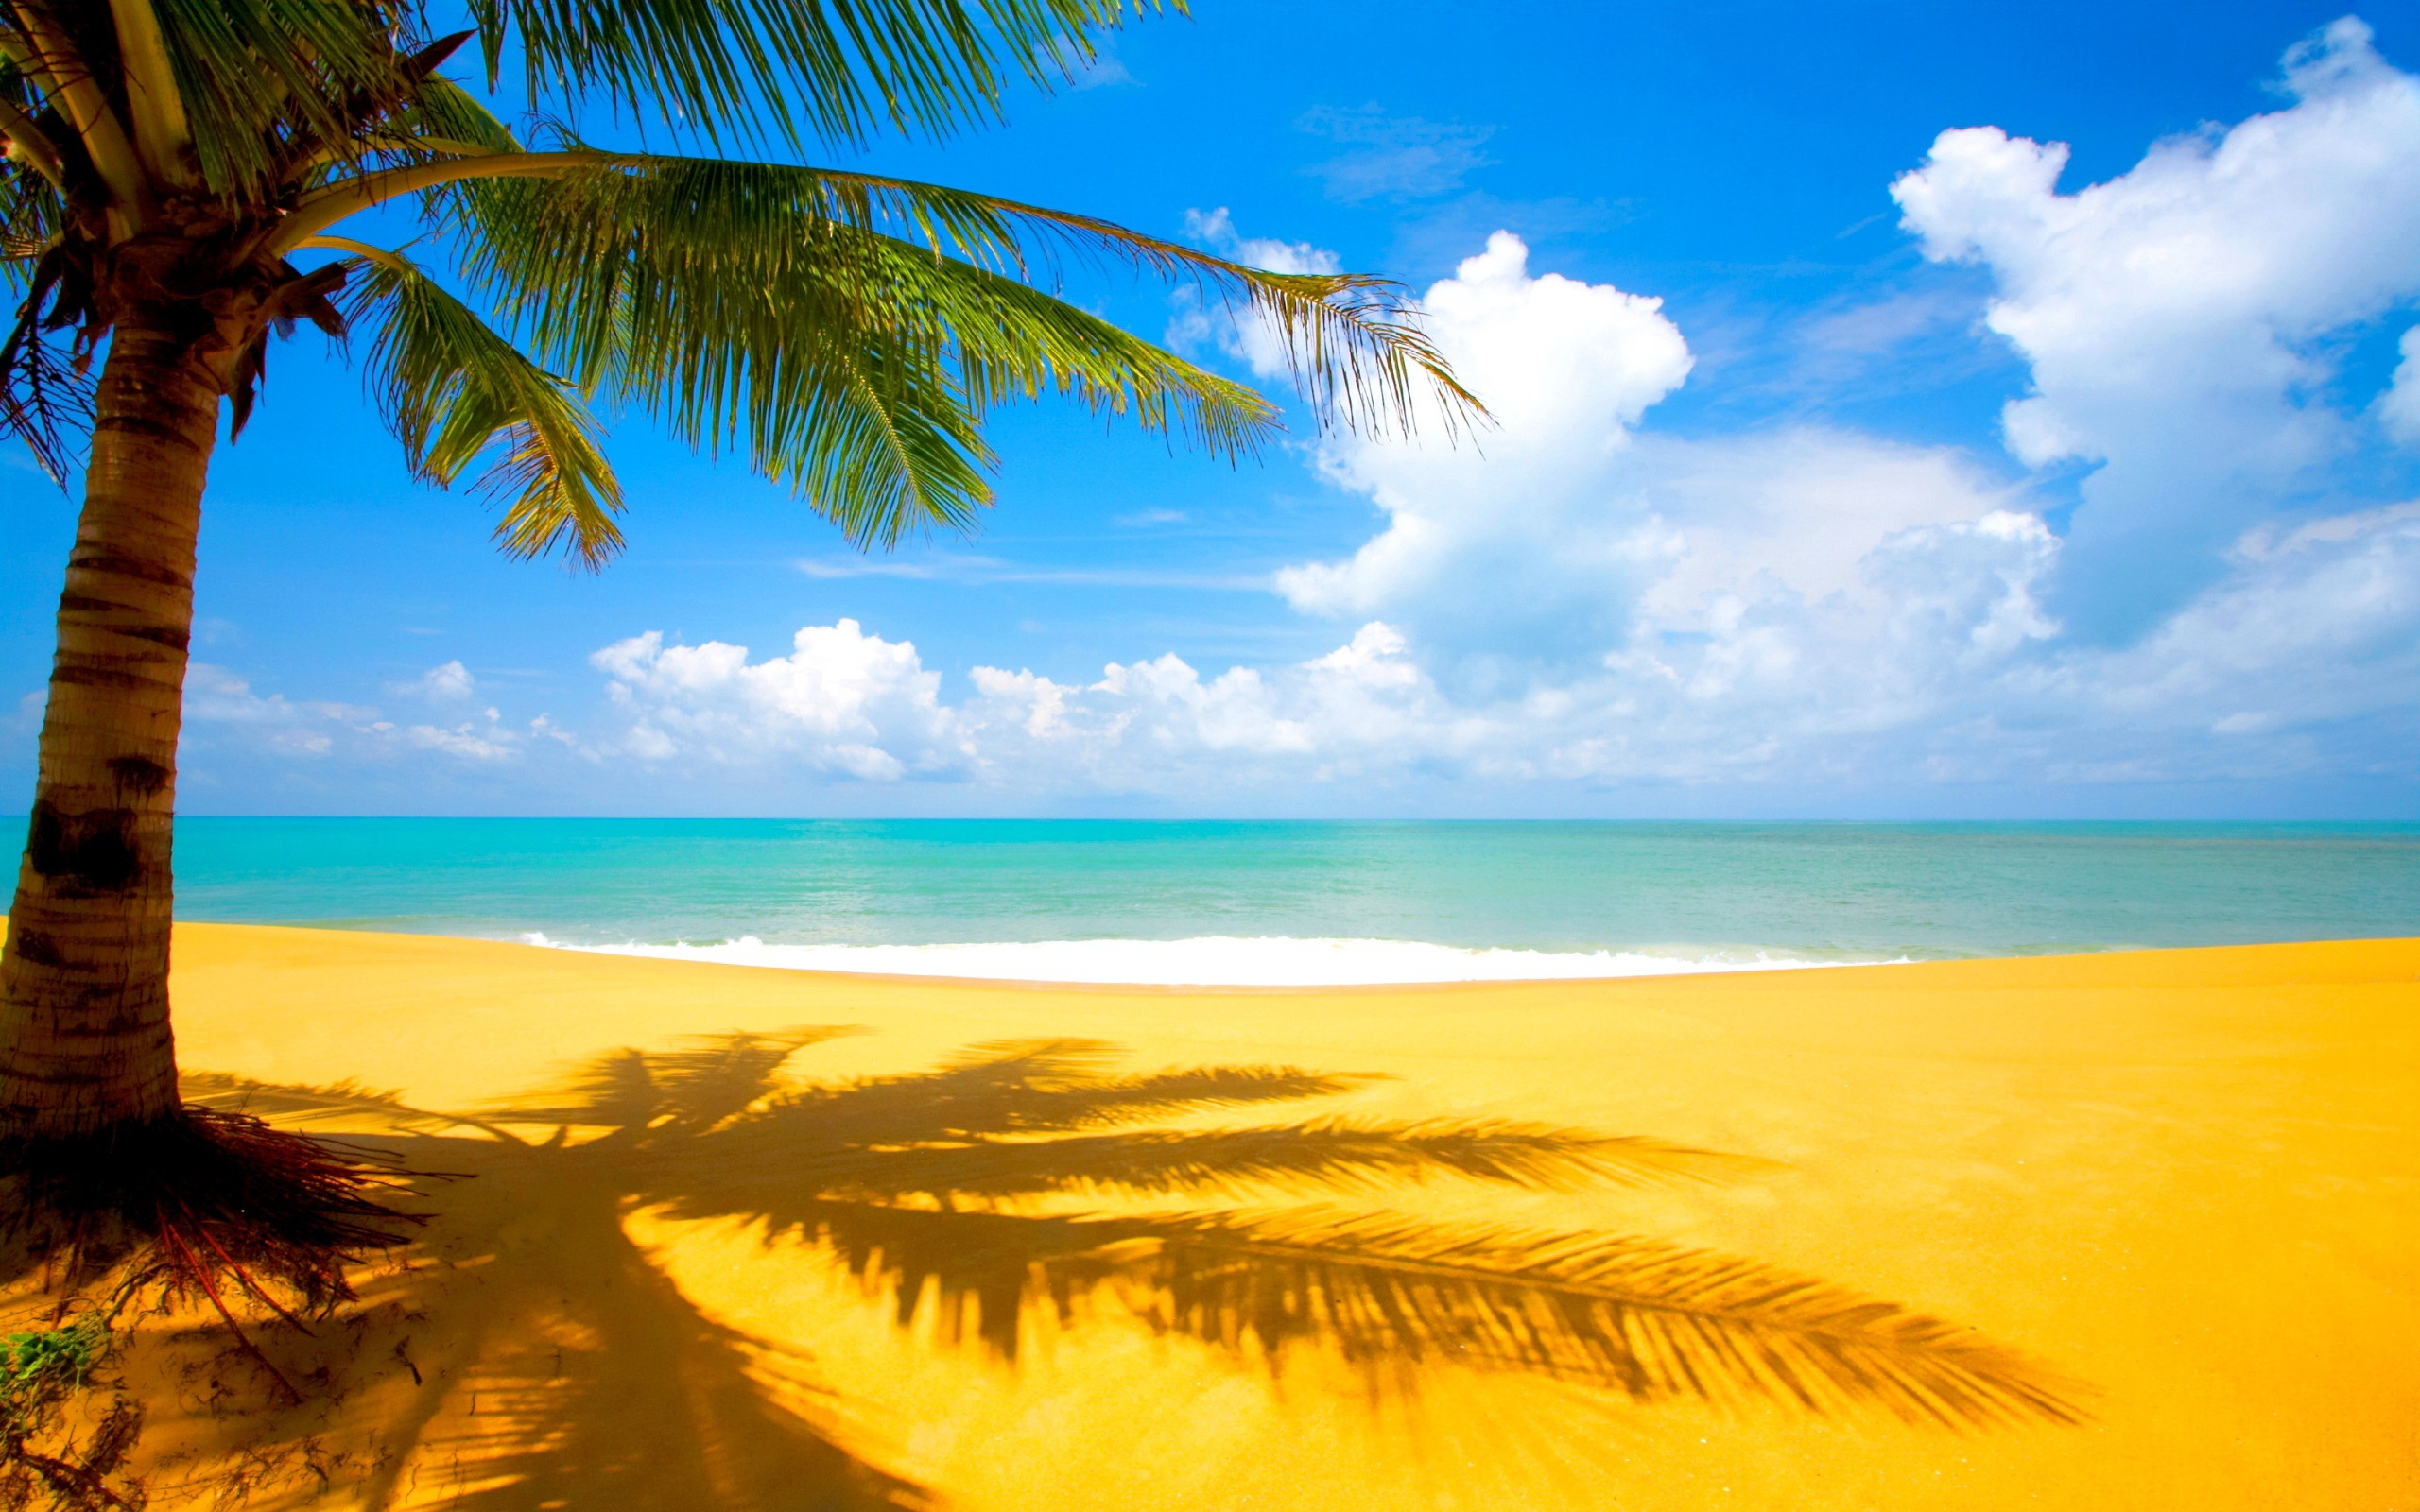 Pin Jamaica Beach Desktop Wallpapers 2560x1600